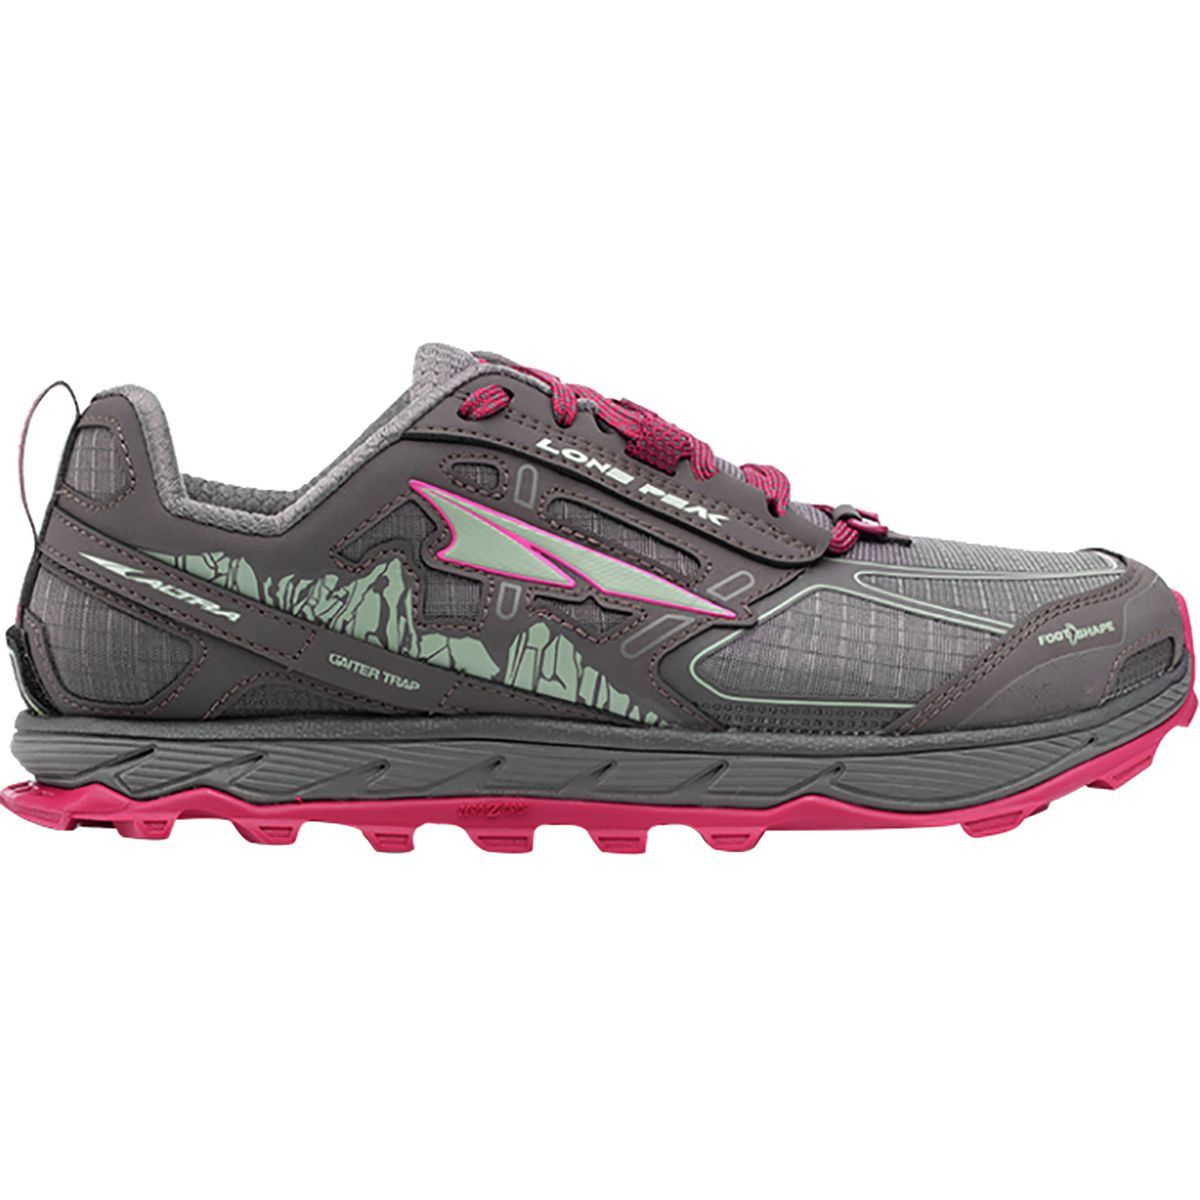 Altra Lone Peak 4.0 Trail Running Shoe - Women's